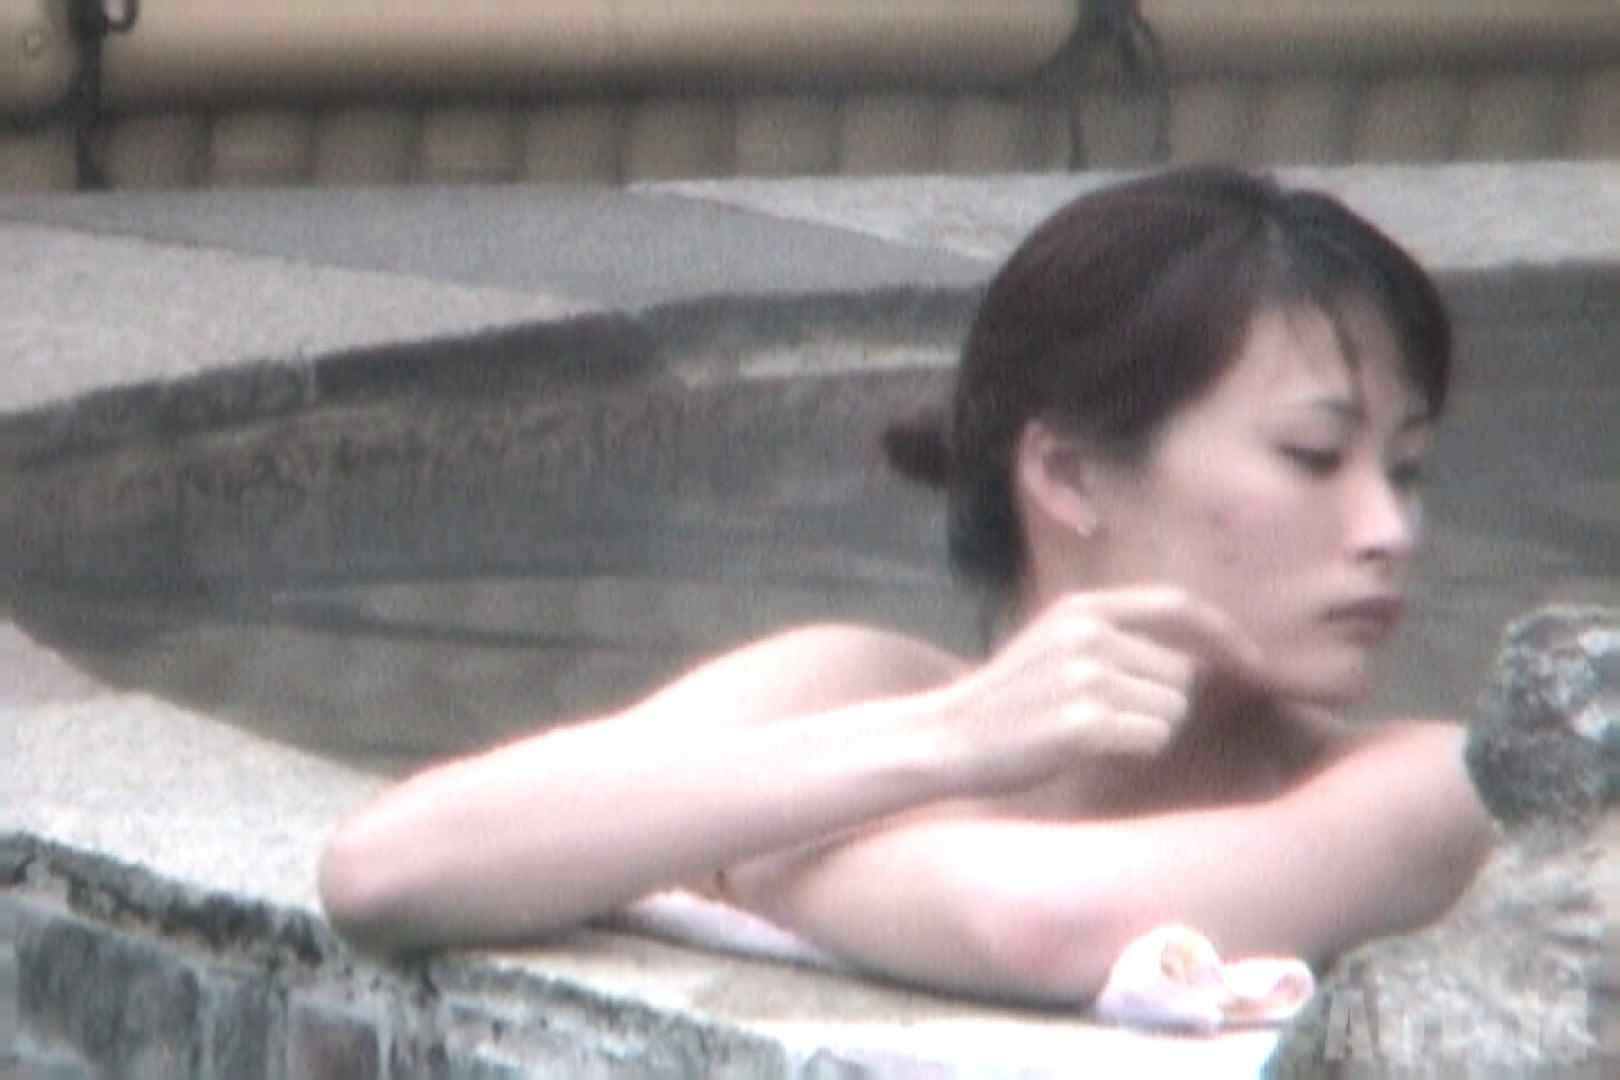 Aquaな露天風呂Vol.822 露天 すけべAV動画紹介 98連発 27